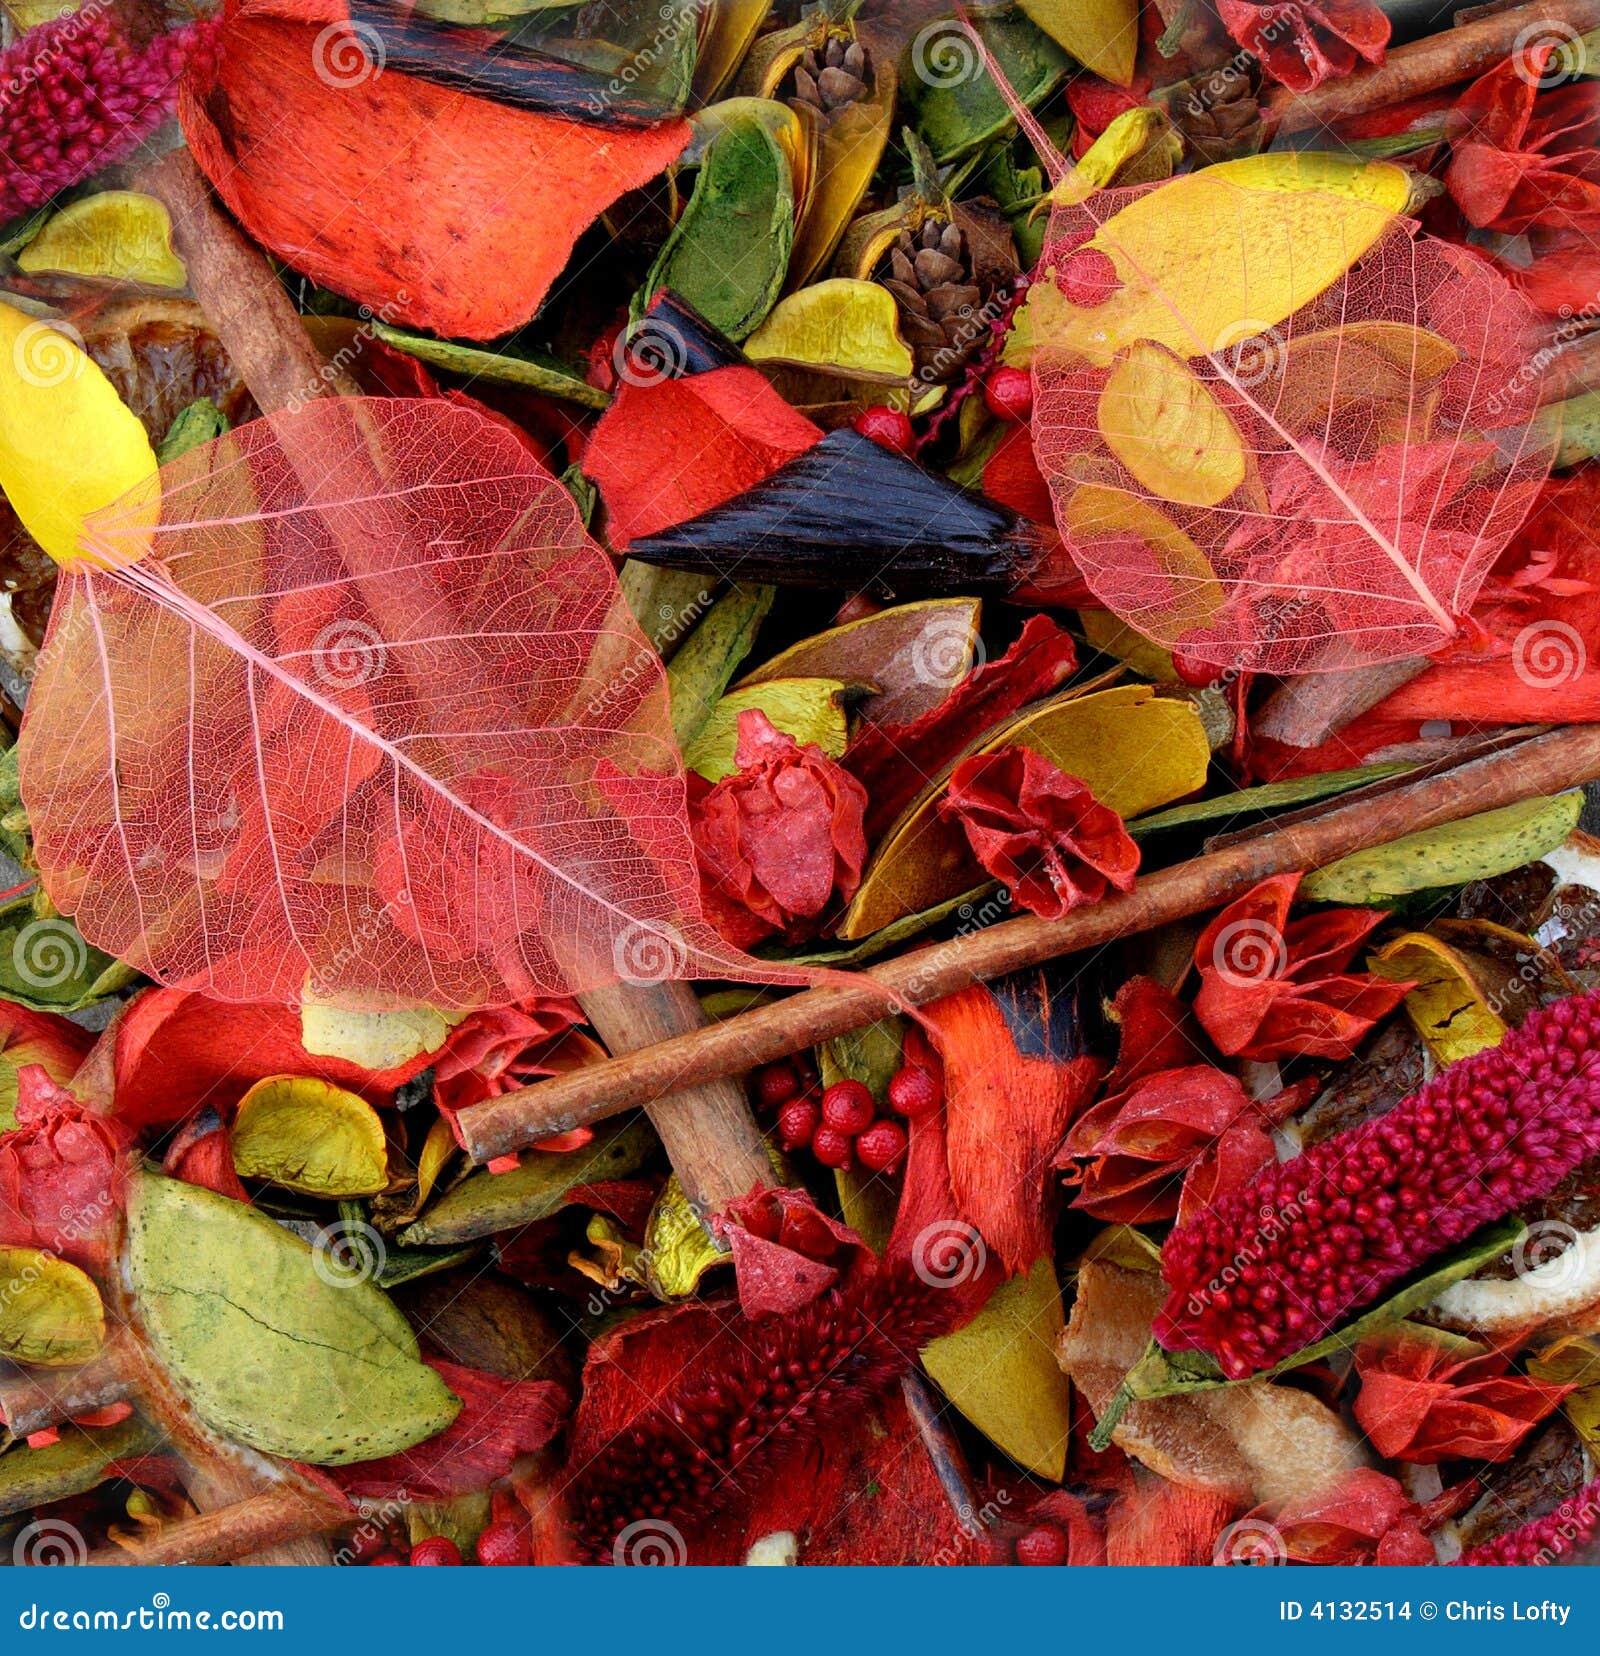 Bowl of Colourful Potpourri